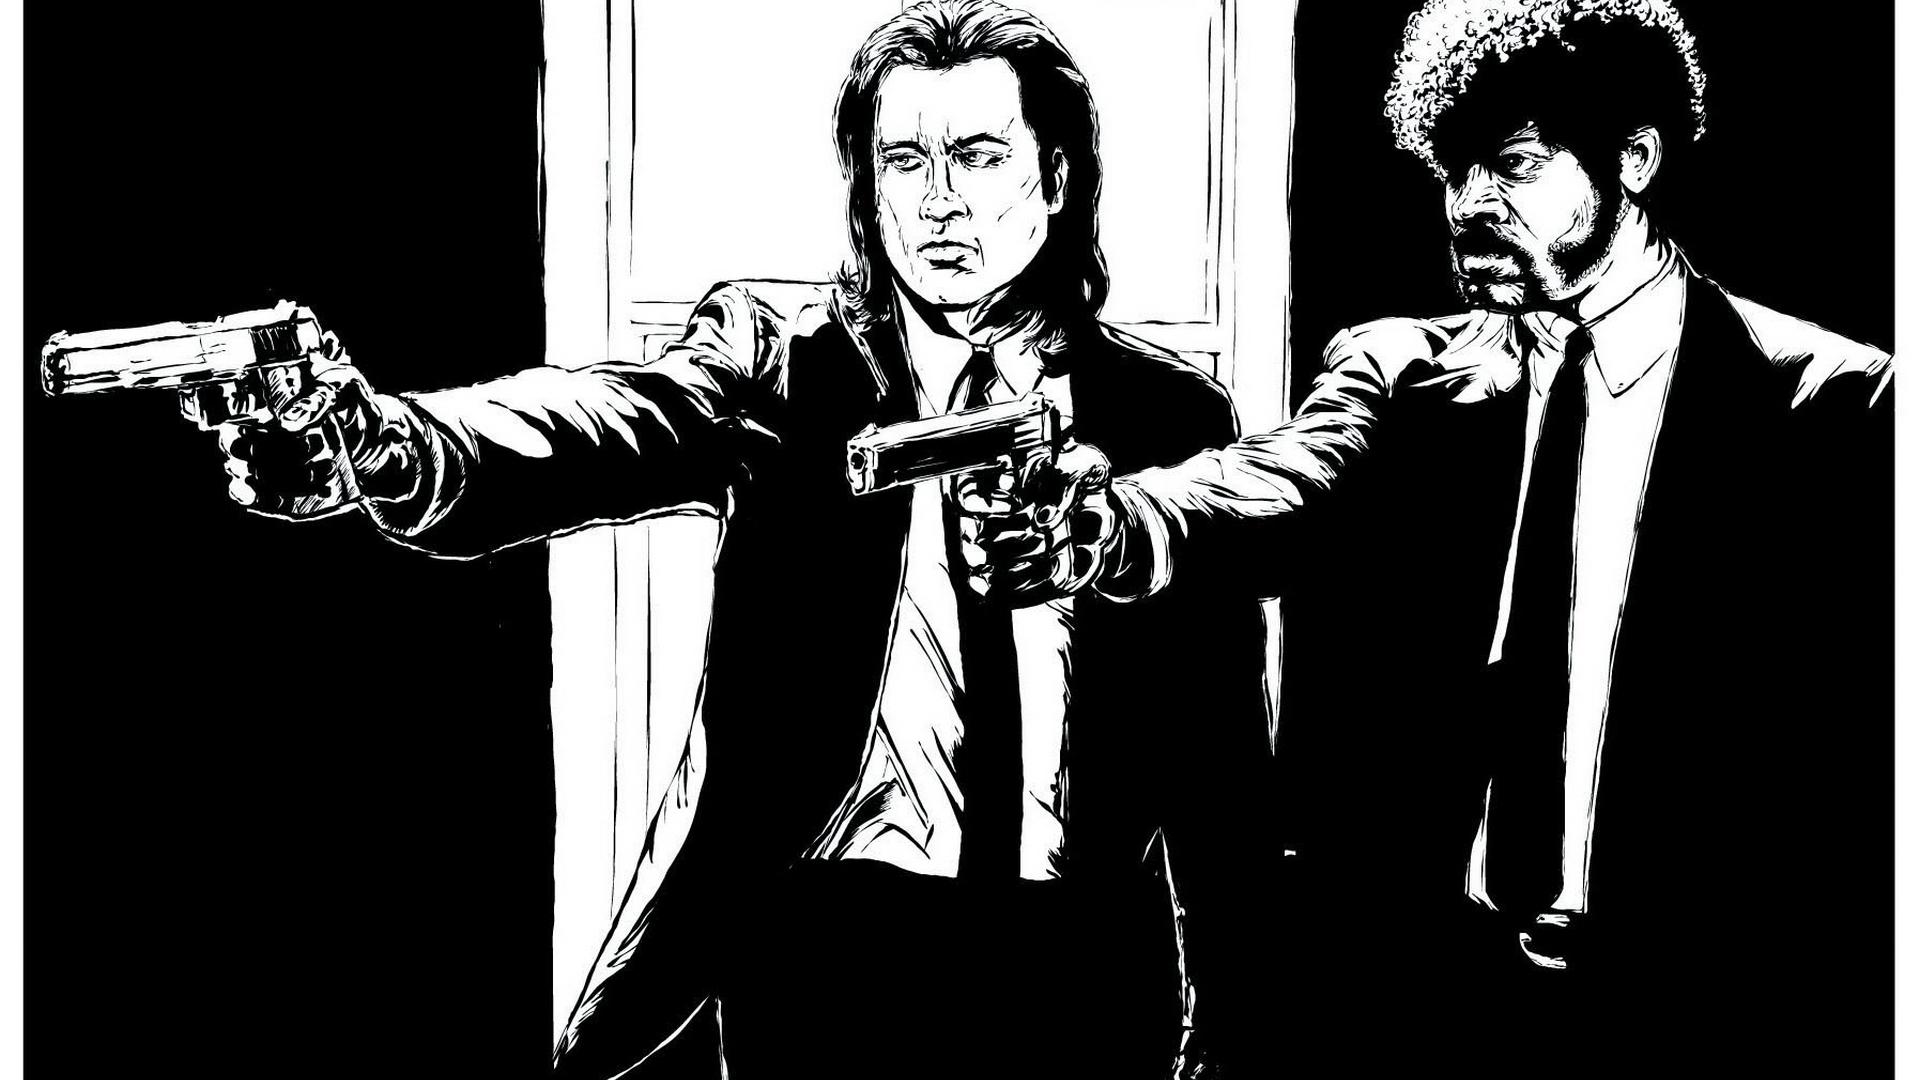 Image Pulp Fiction pistol Men Movies Vector Graphics 1920x1080 Pistols Man film